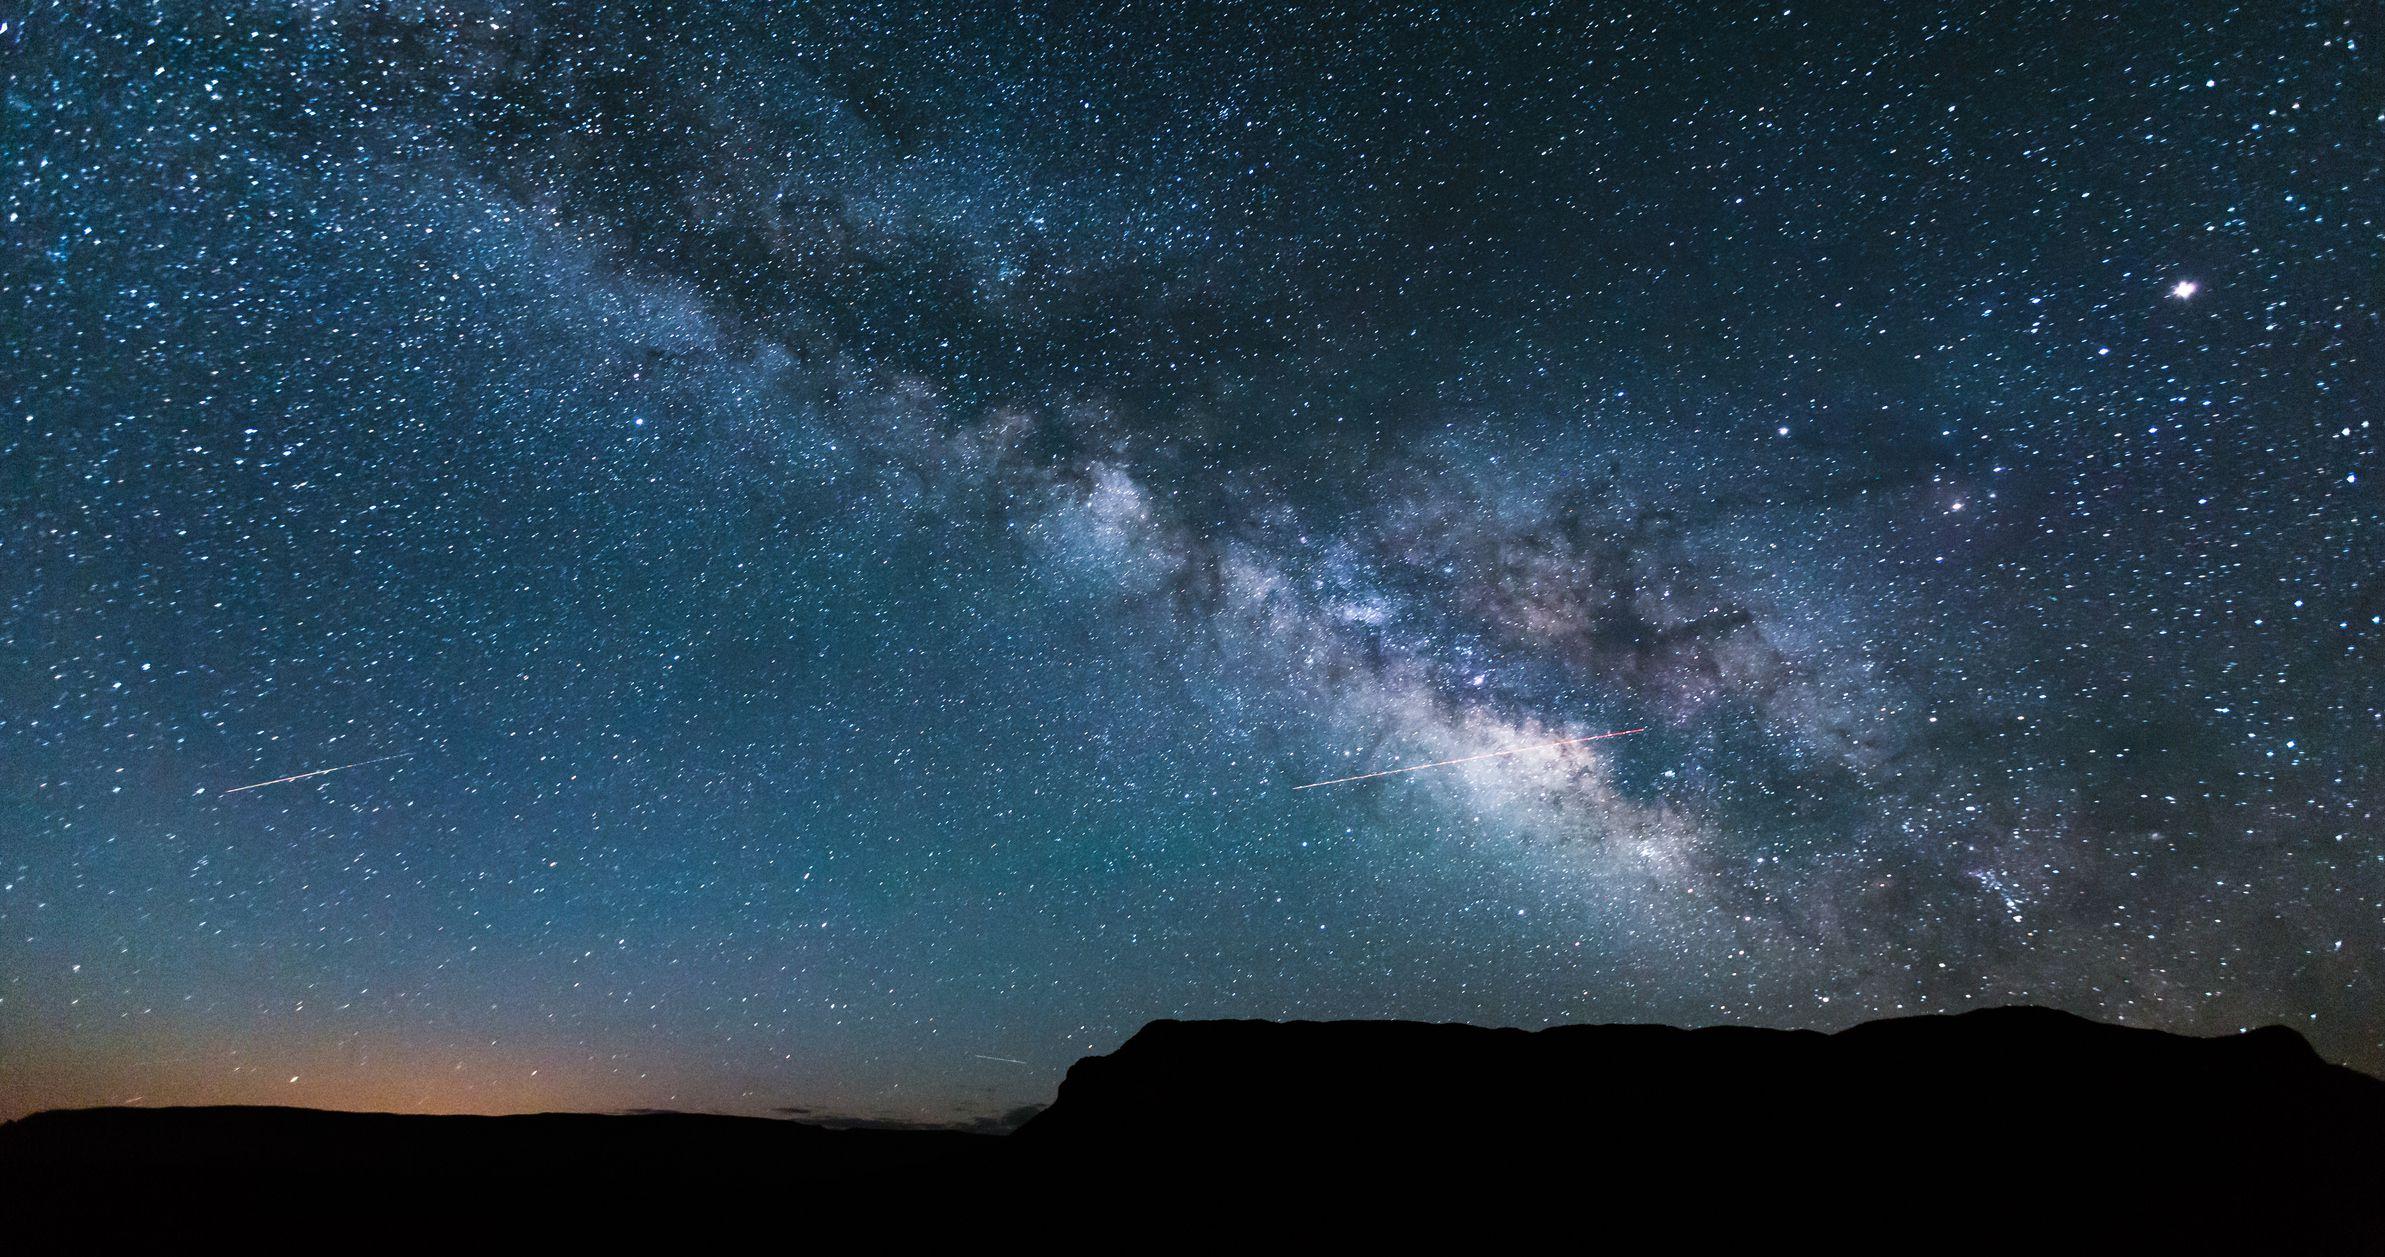 Dark Sky Astronomy Sites in Arizona